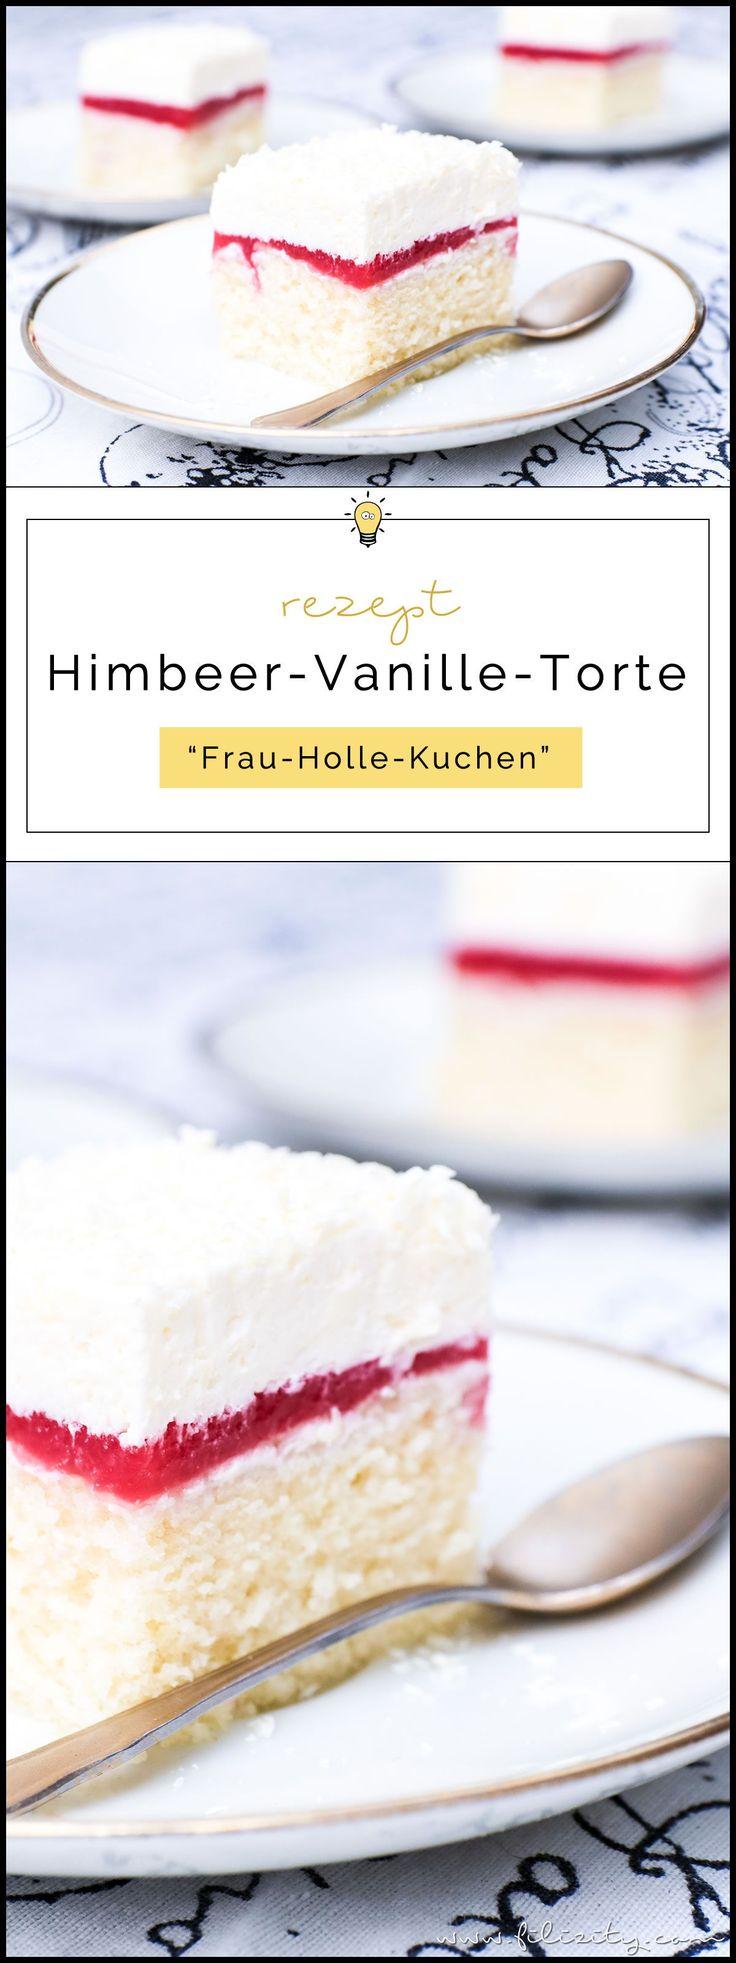 Himbeer-Vanille-Torte (Frau Holle Kuchen) – Rüya Kamalak